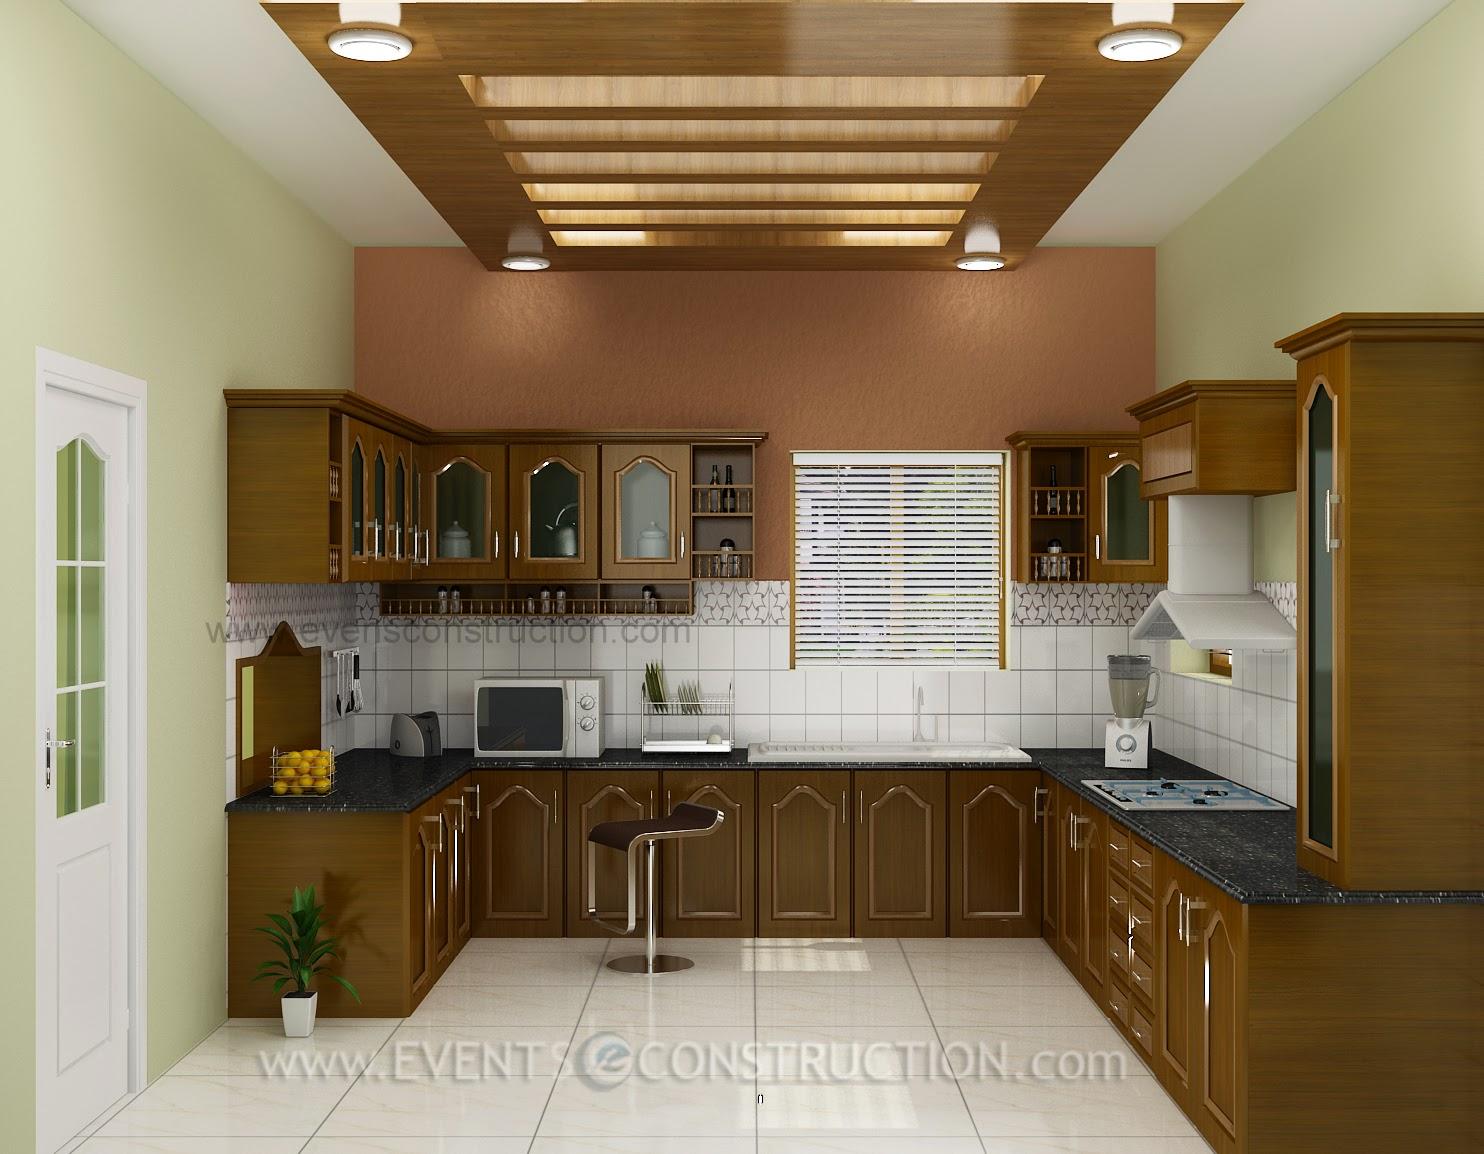 kerala kitchen interior design living room interiors pdf design room interior design kitchen interior design home design